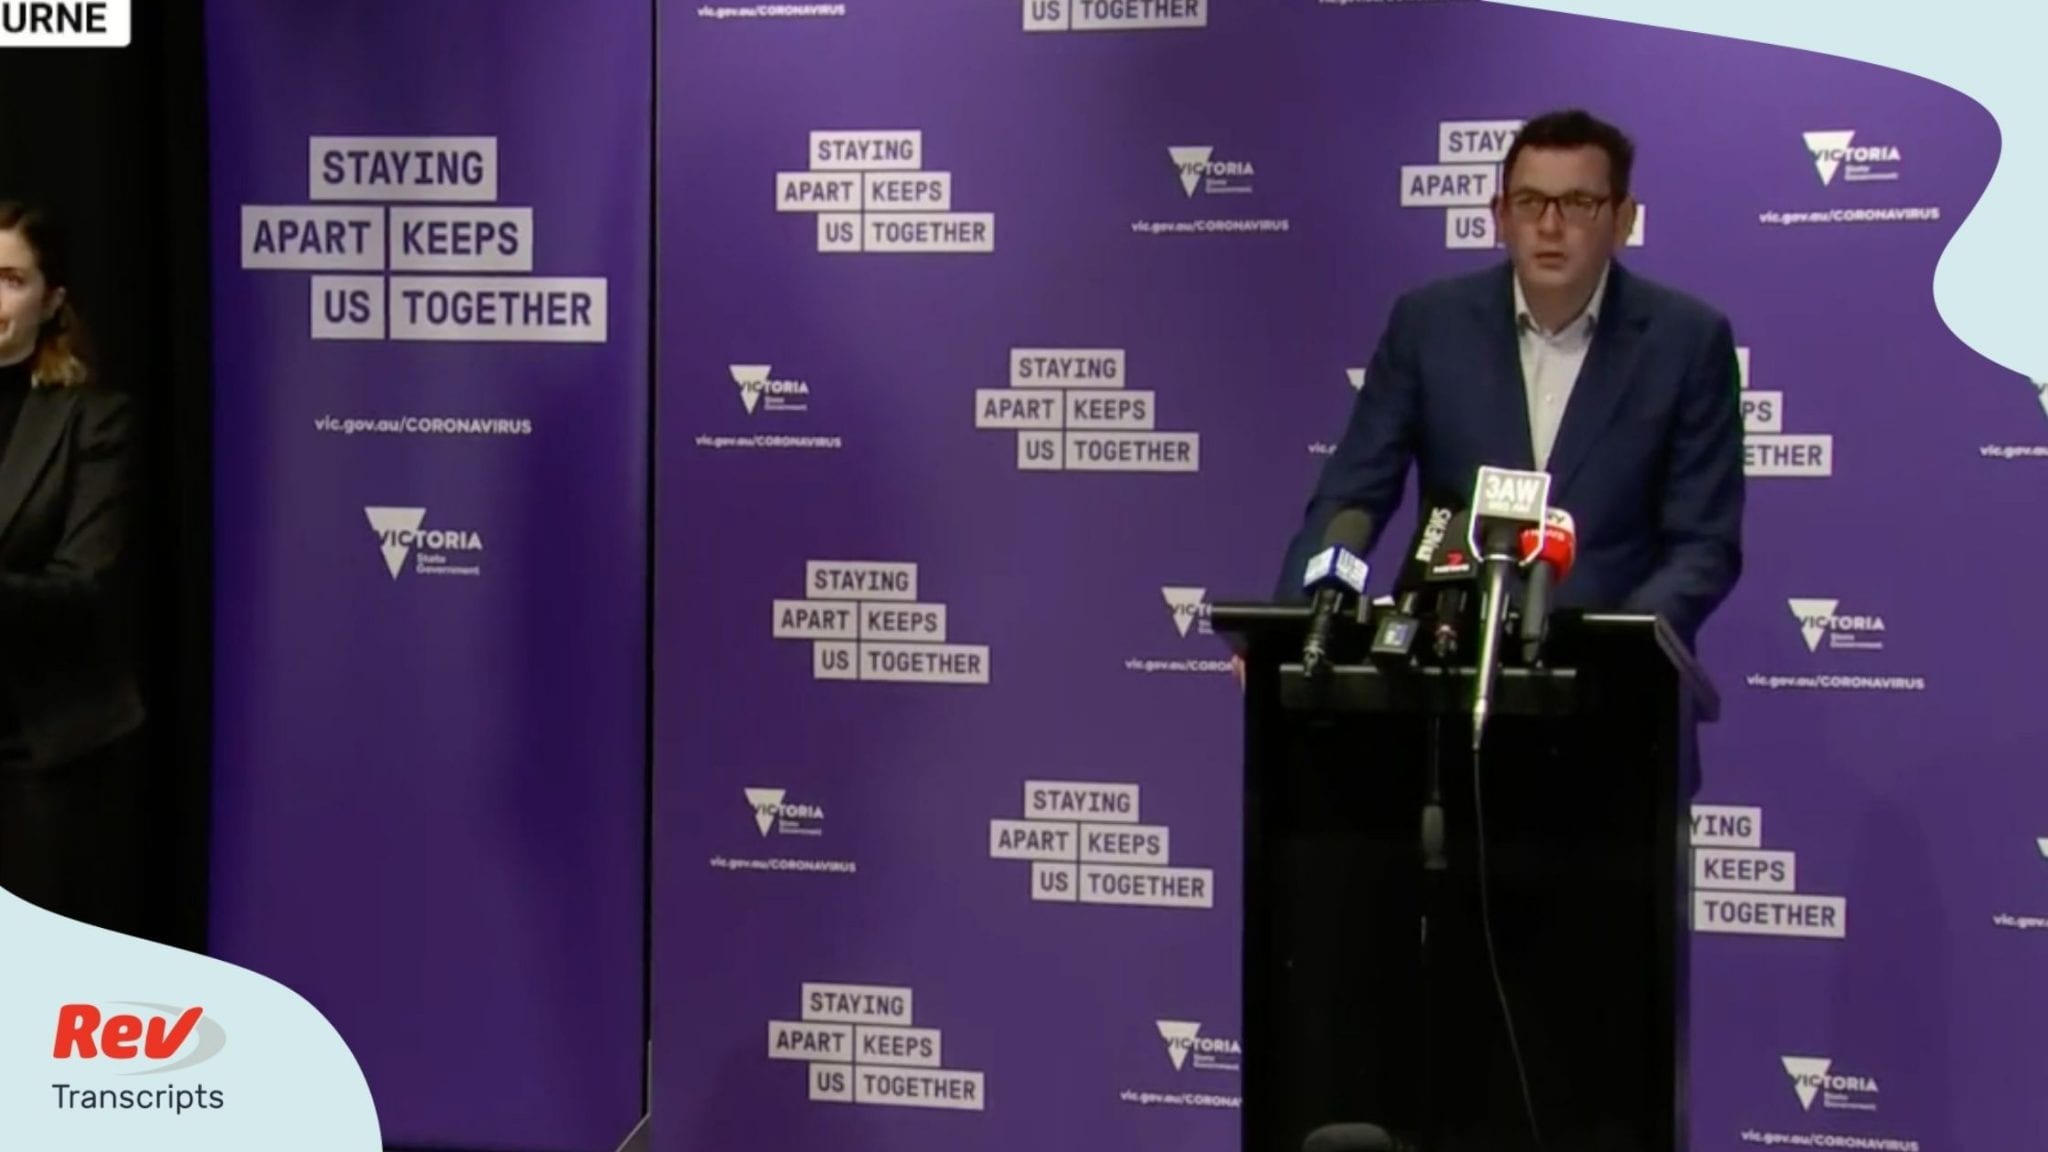 Premier Dan Andrews Press Conference Transcript As Victoria Returns To Lockdown August 4 Rev